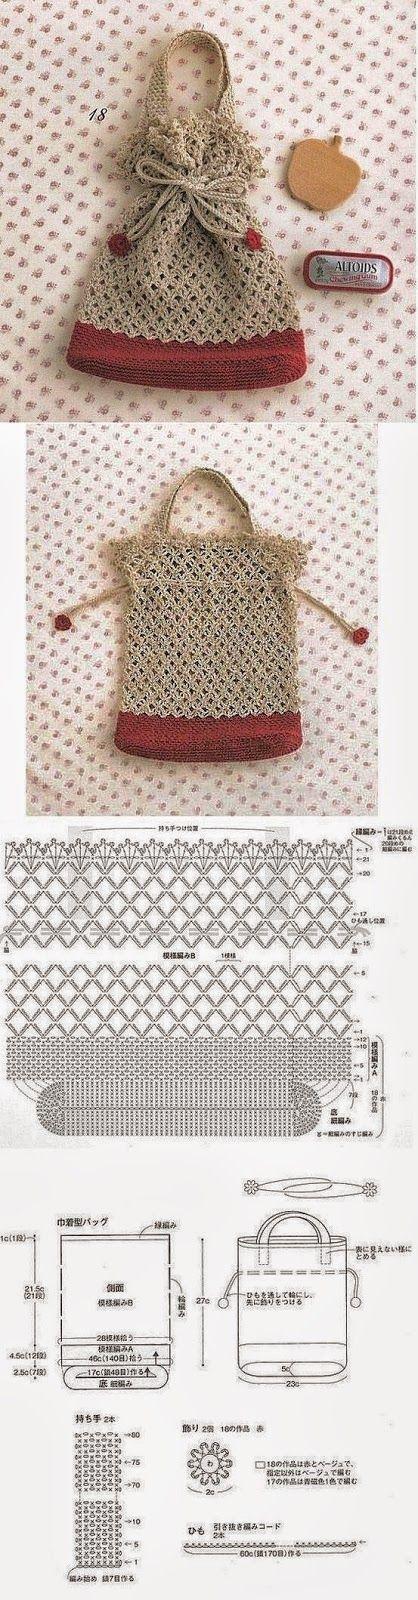 Moldes y esquemas de bolso ganchillo